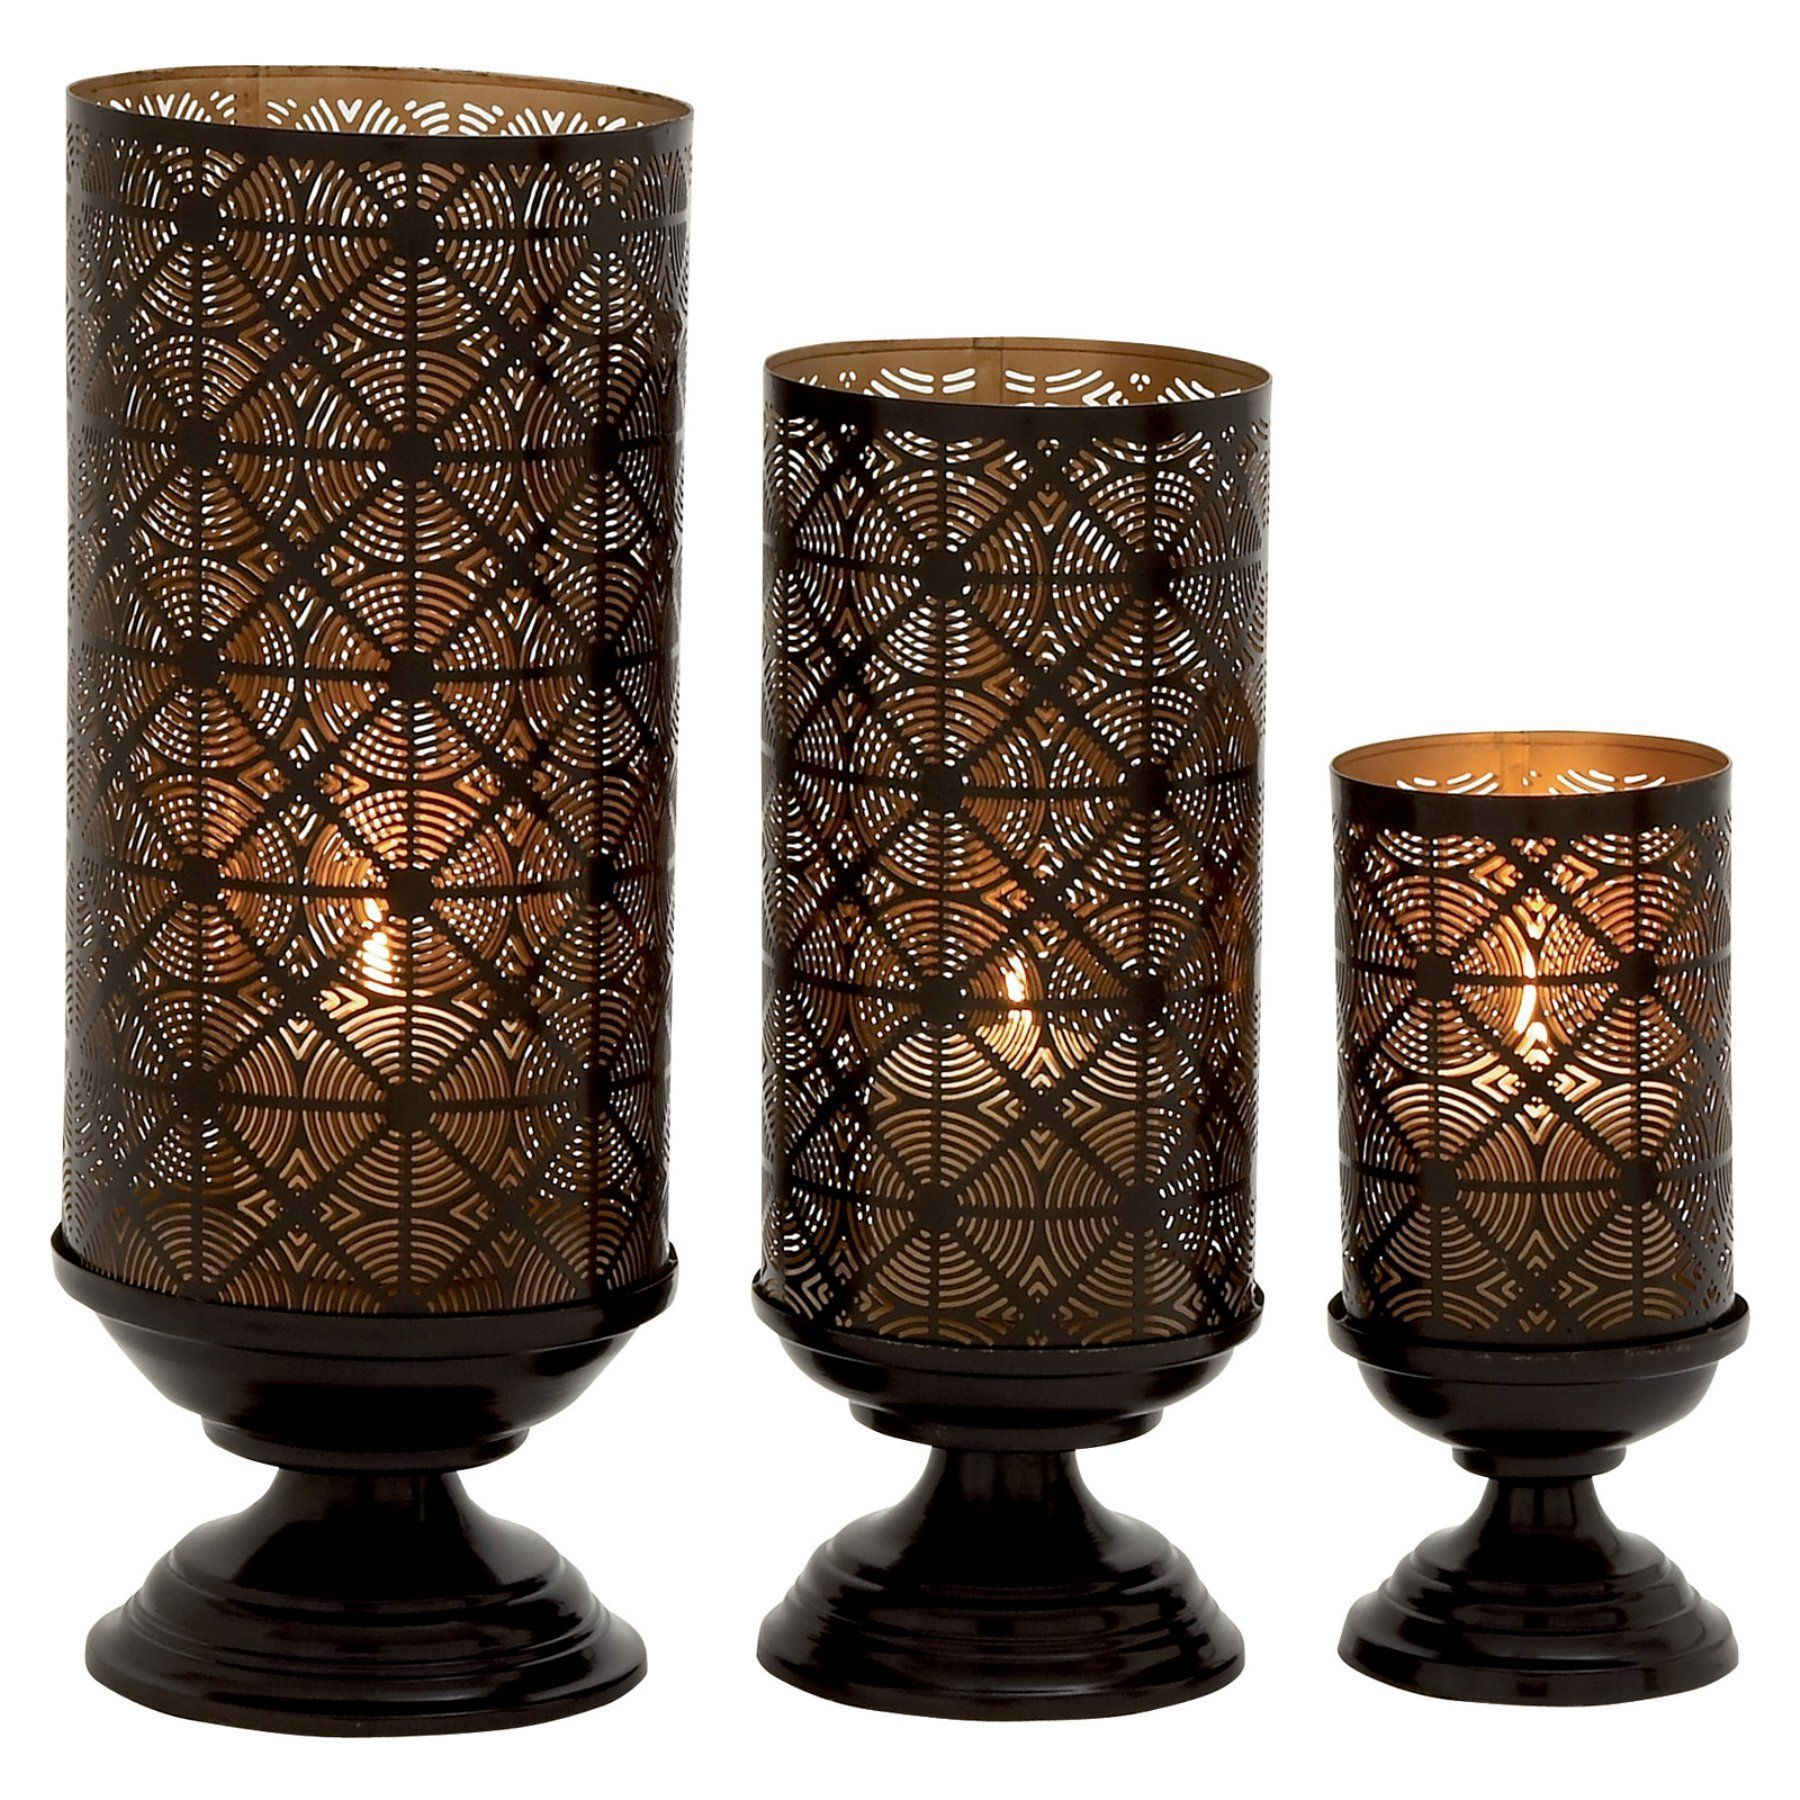 Decmode pedestal base hurricane candle holders set of